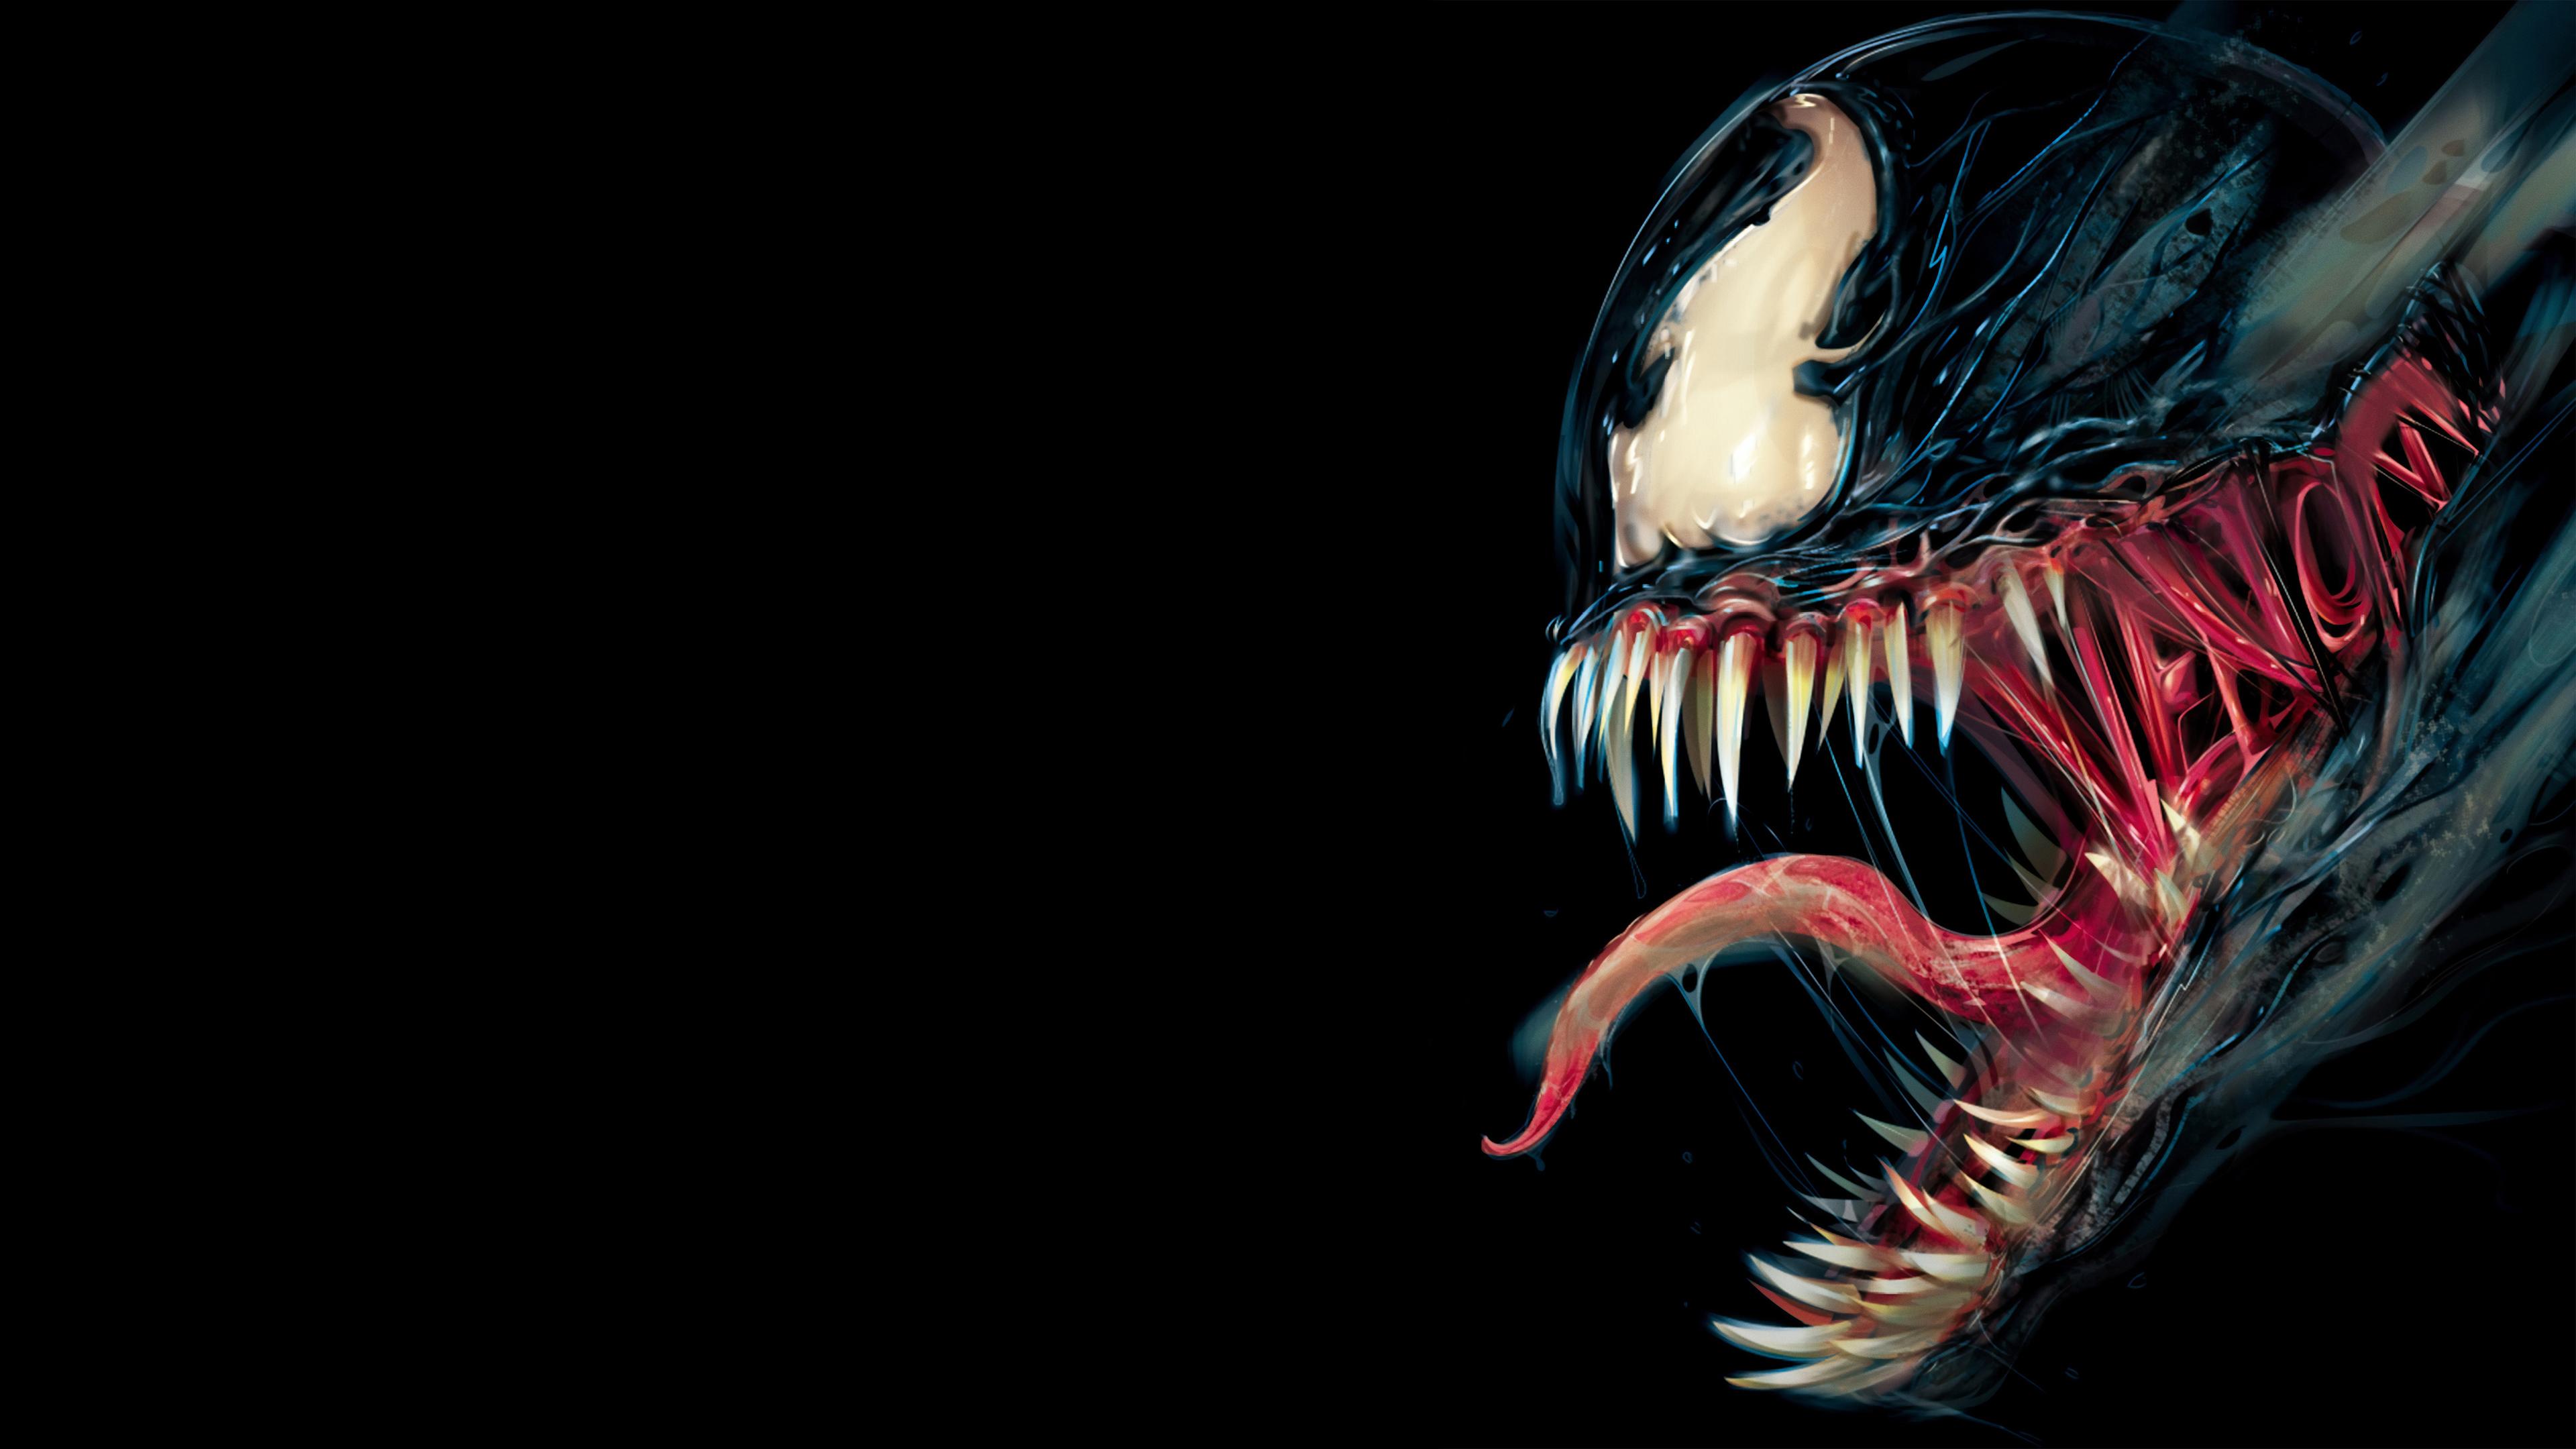 2048x2048 Venom 2018 Movie 4k Ipad Air Hd 4k Wallpapers: Venom Movie 4k Poster Venom Wallpapers, Venom Movie